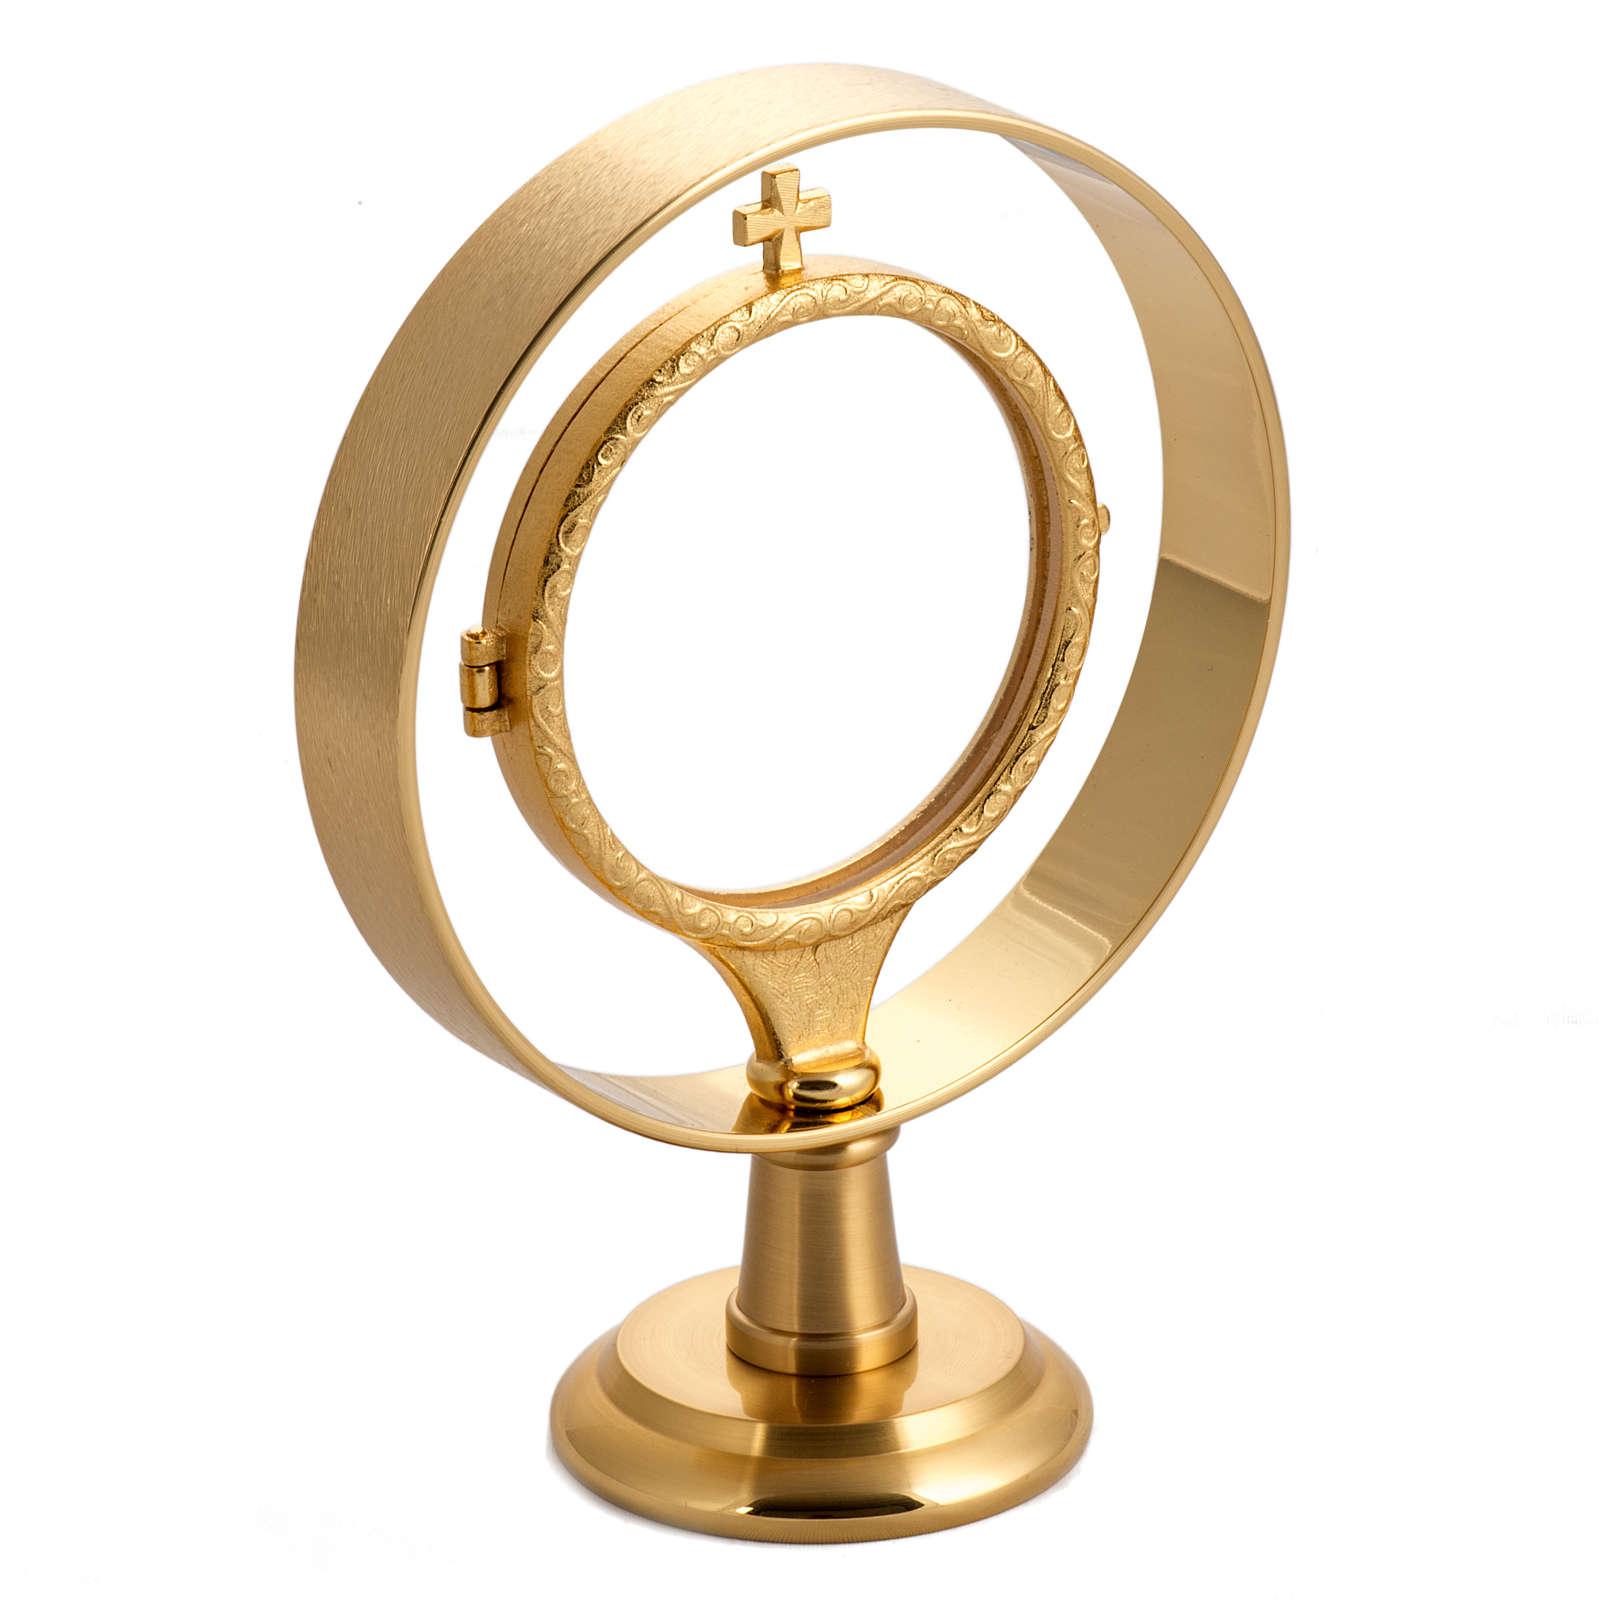 Teca per ostia magna (diam 7 cm) ottone dorato liscio 4